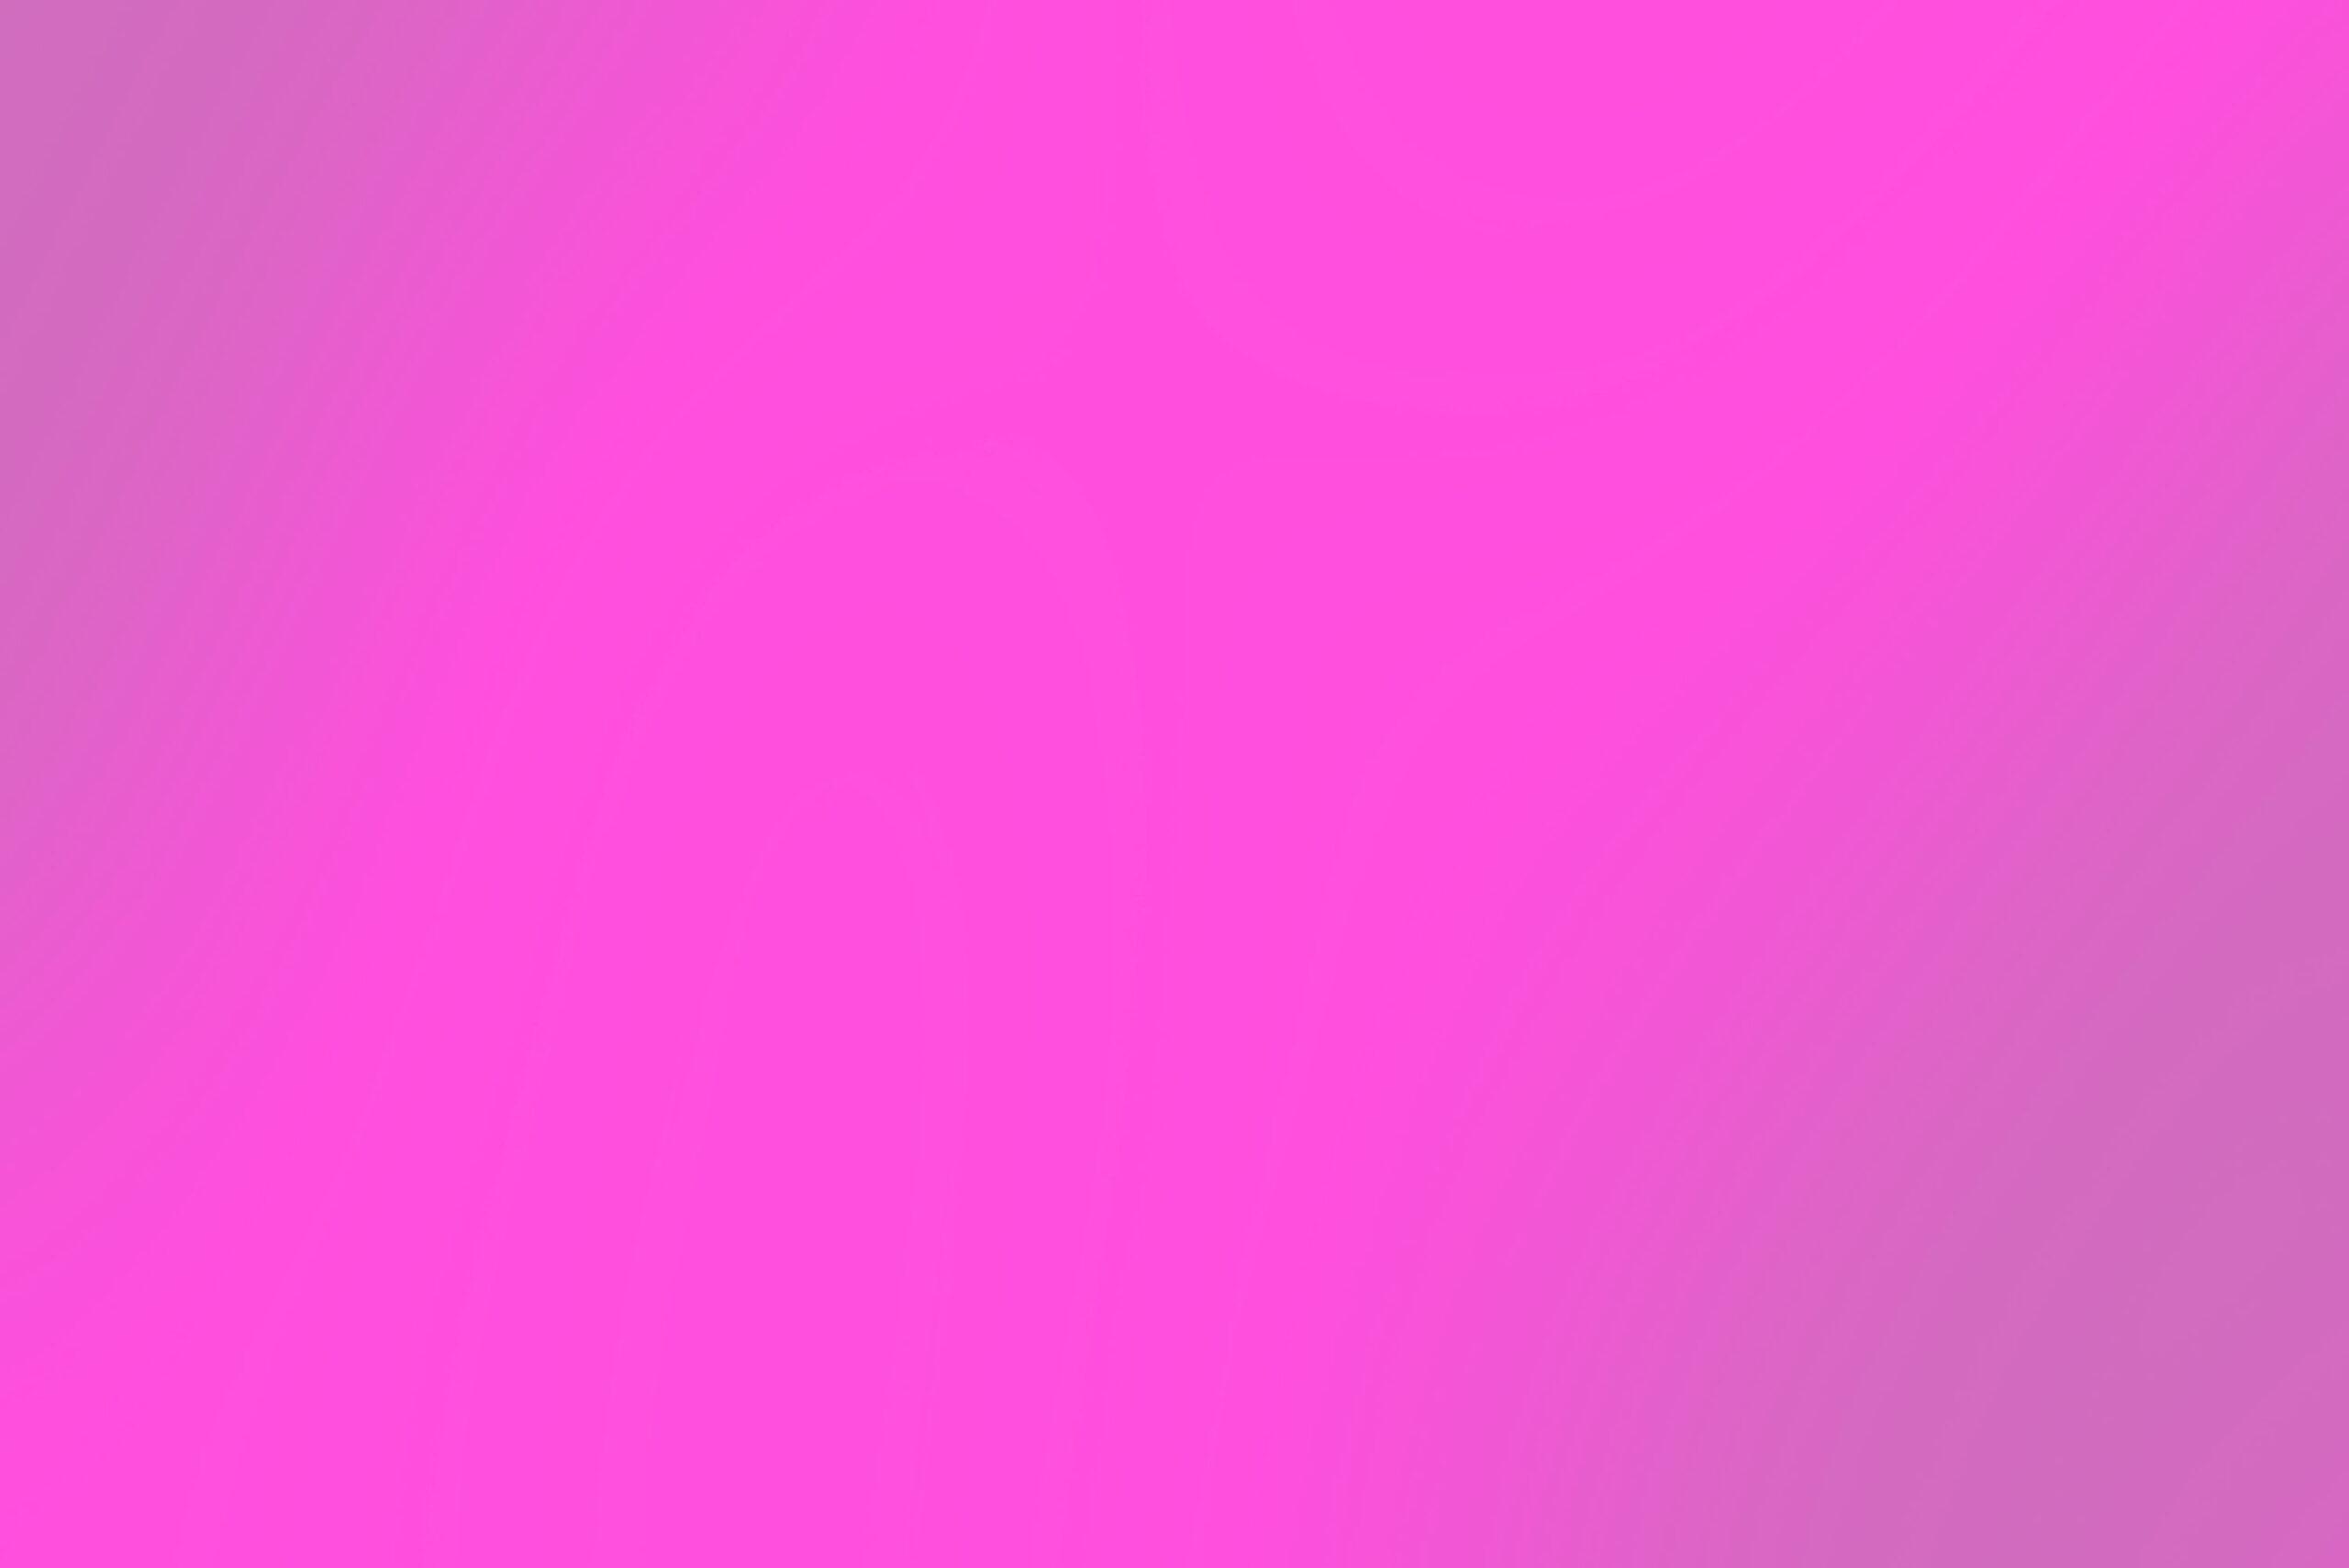 rose-scaled.jpg